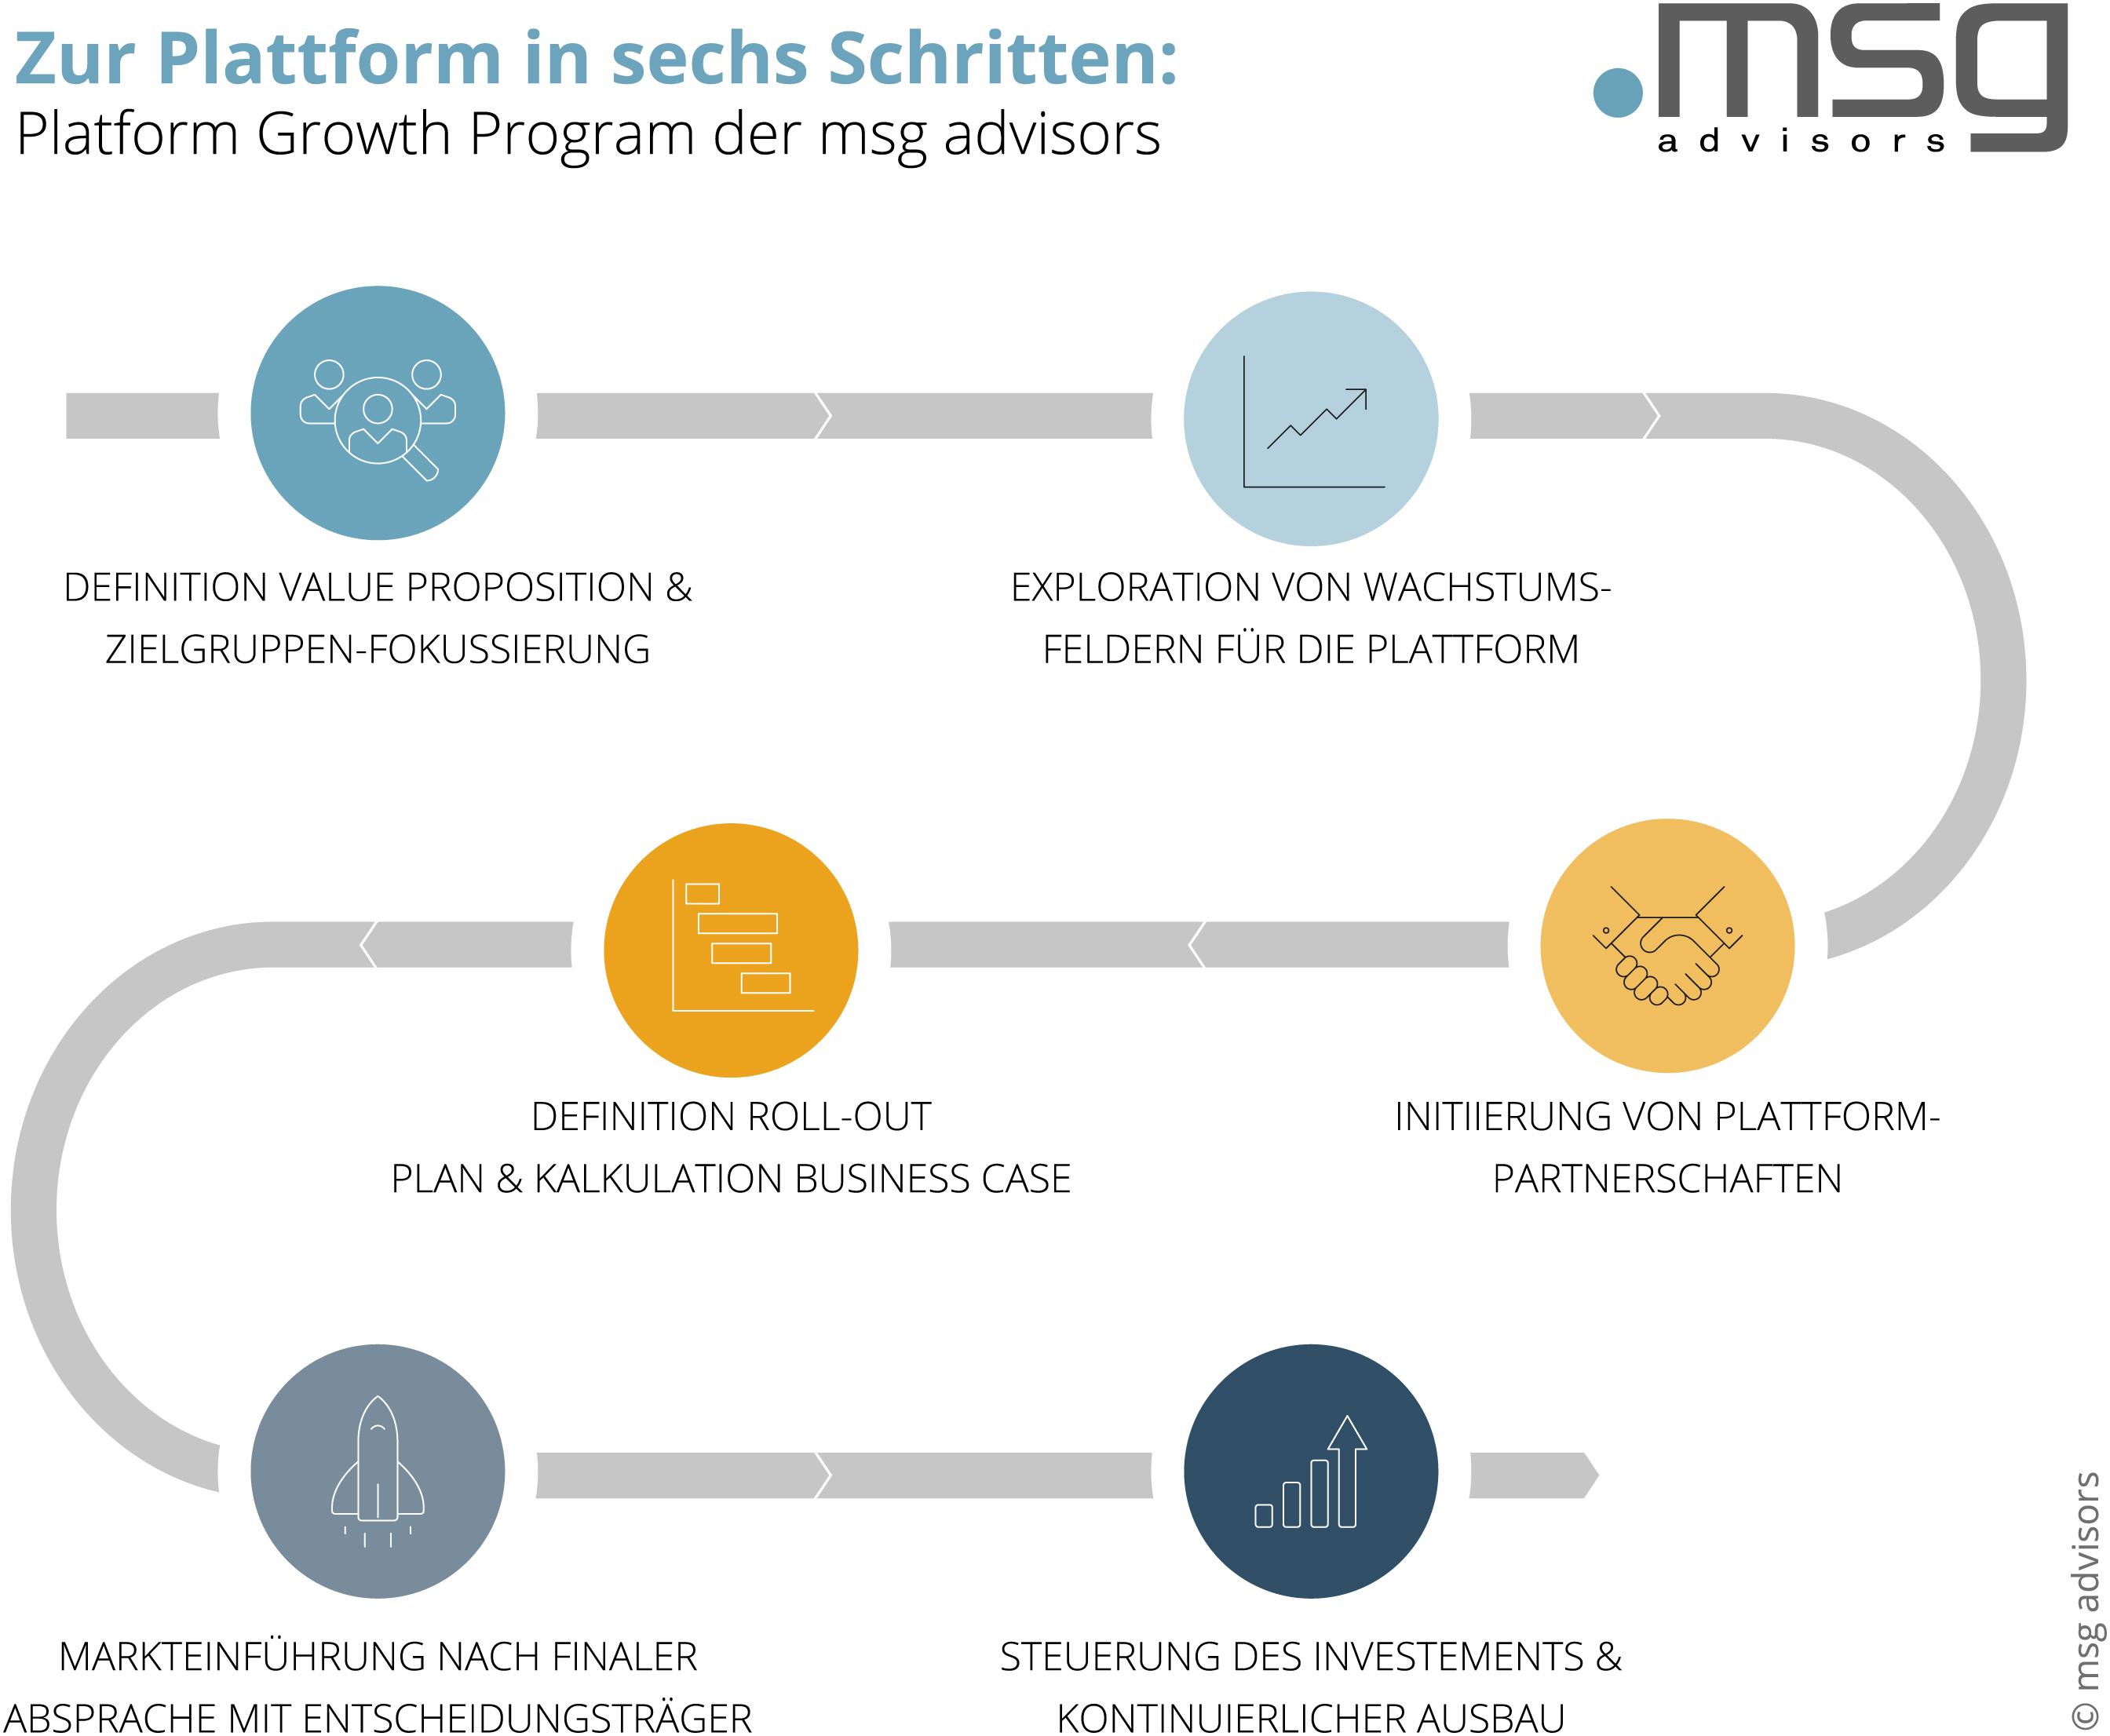 20200505_mad_Grafiken_Platform-Growth_DE03.jpg